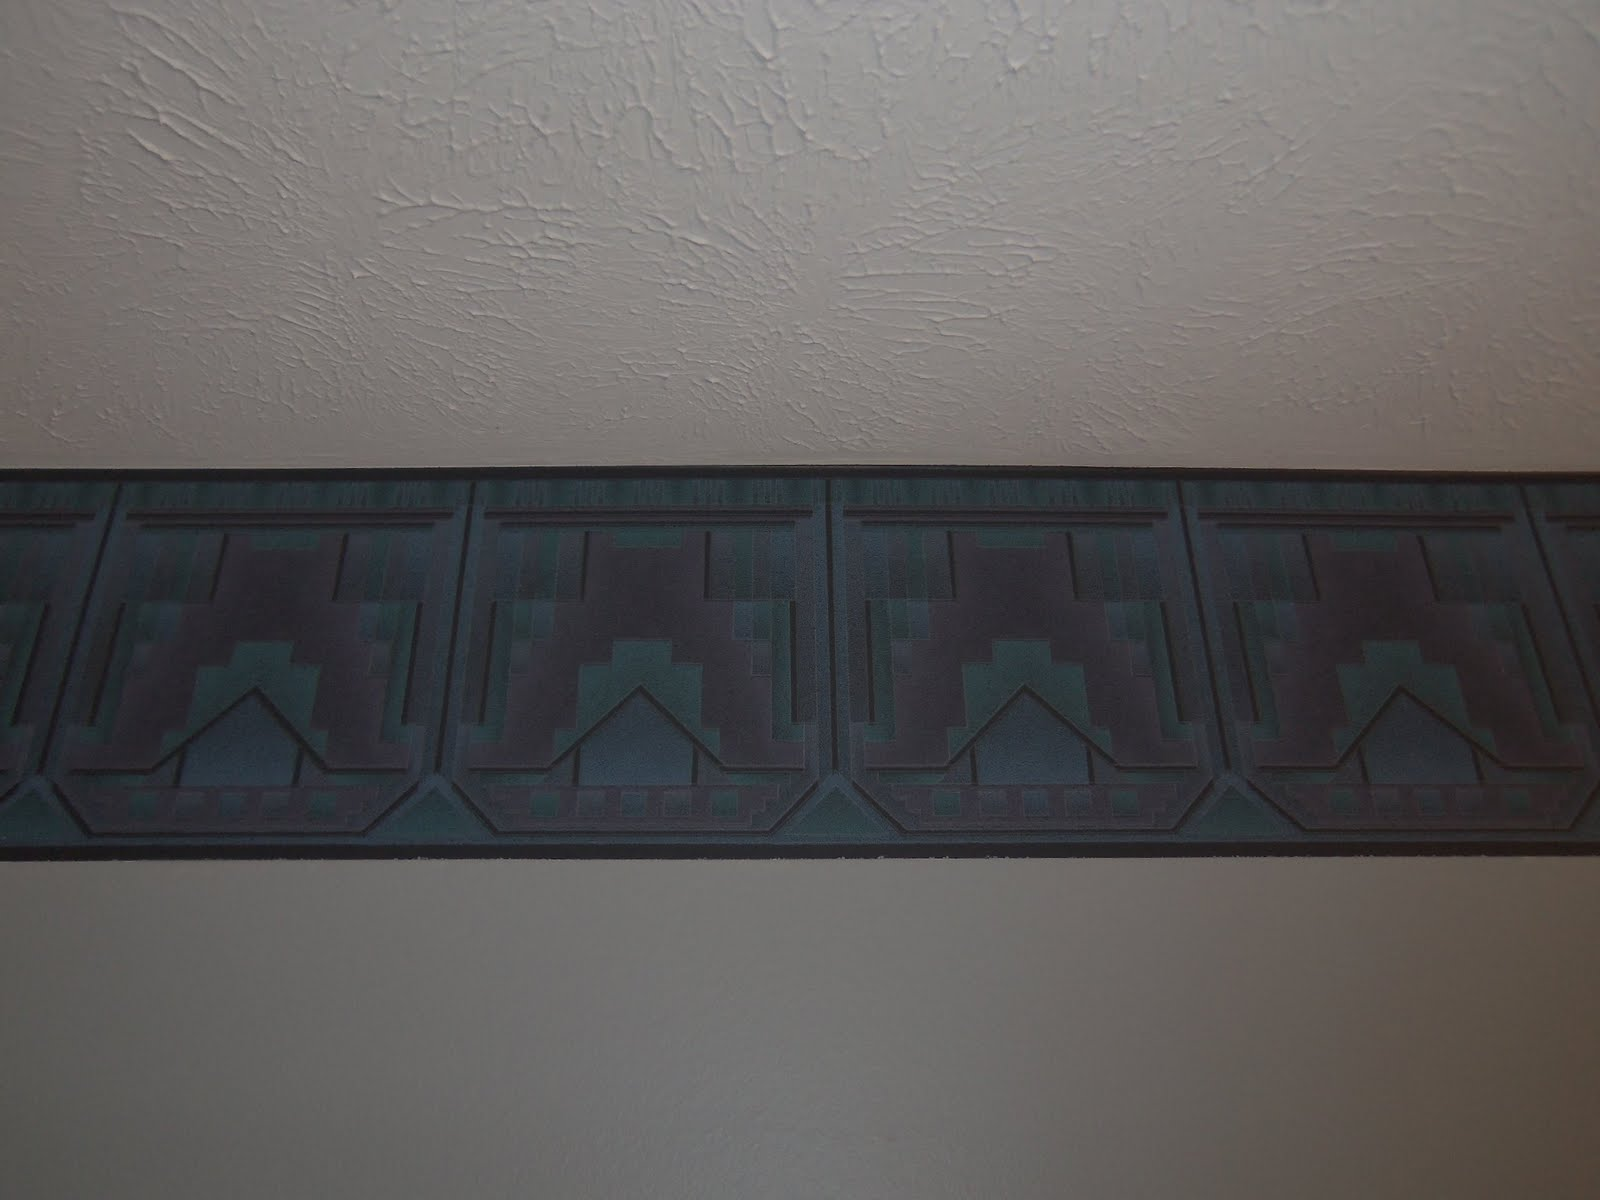 sayin tools dif wallpaper remover wallpaper removal tools home depot 1600x1200